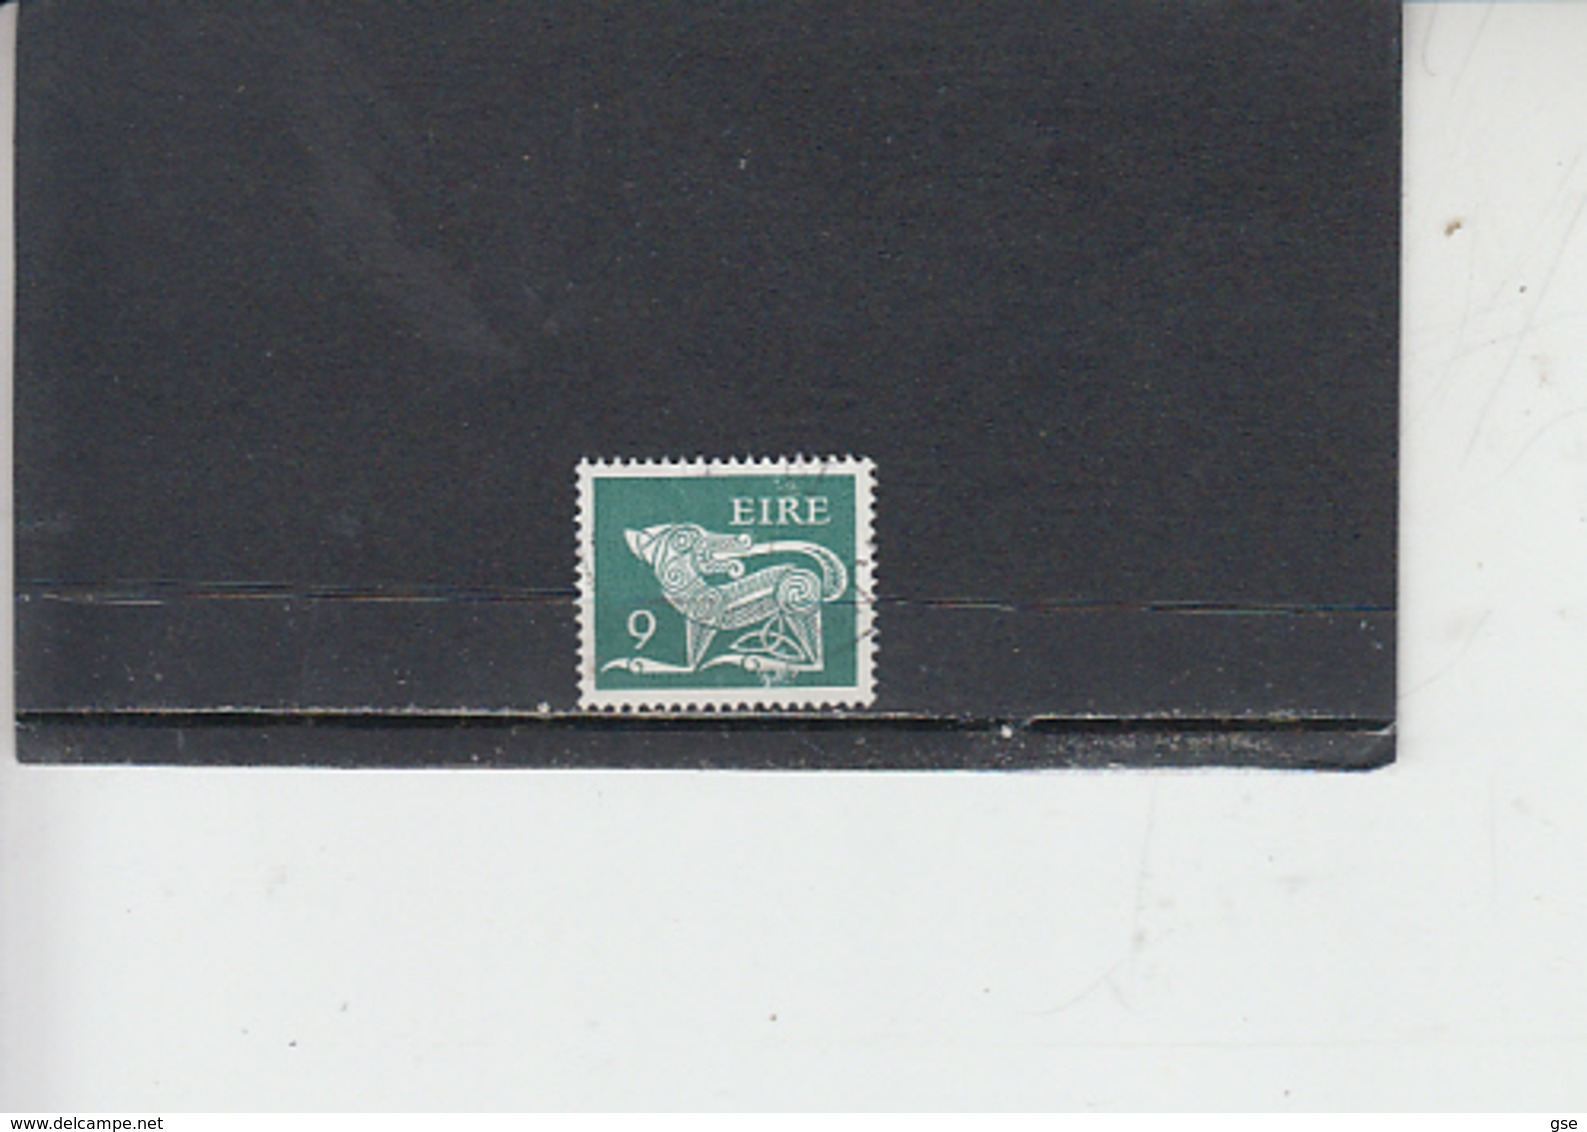 IRLANDA  1976 -  Unificato 349A°-  Animale Simbolico - Usati